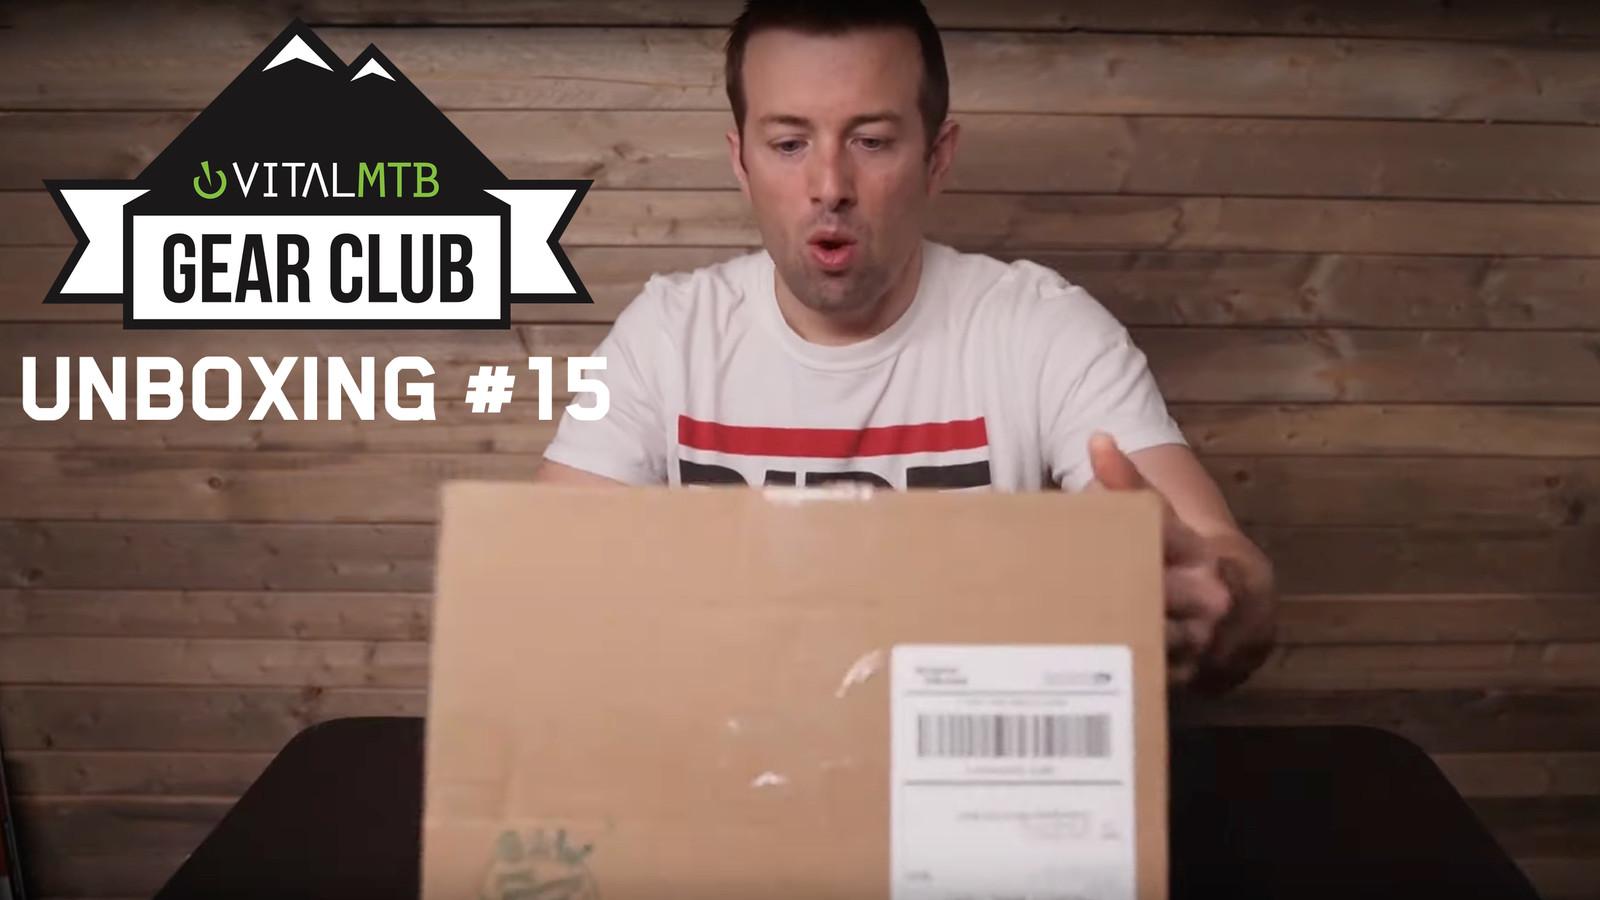 UNBOXING #15 - Vital Gear Club